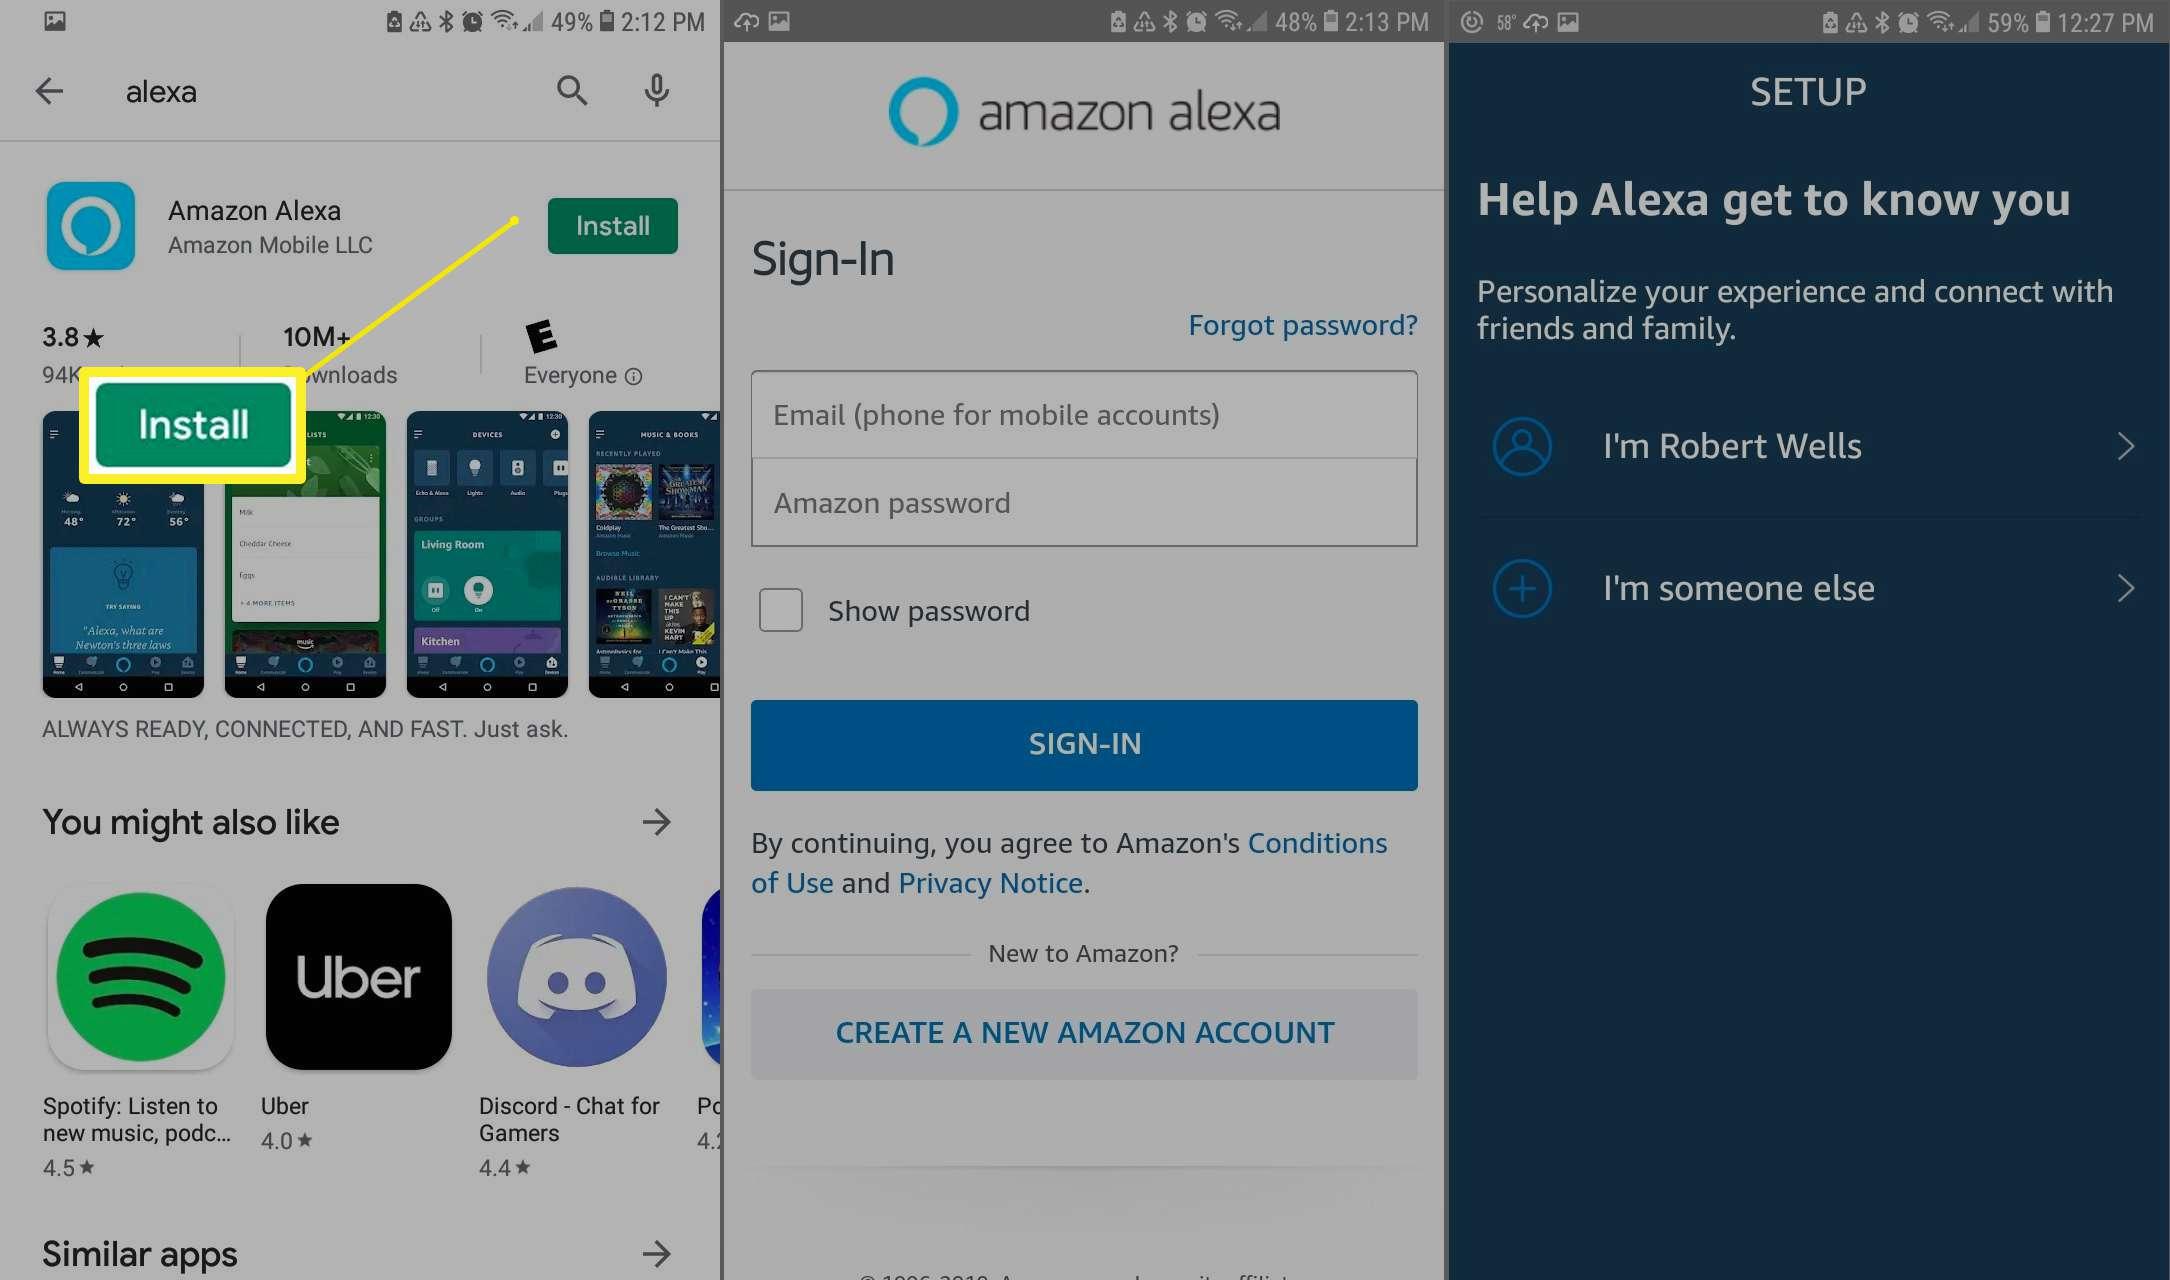 Installing Alexa on Android